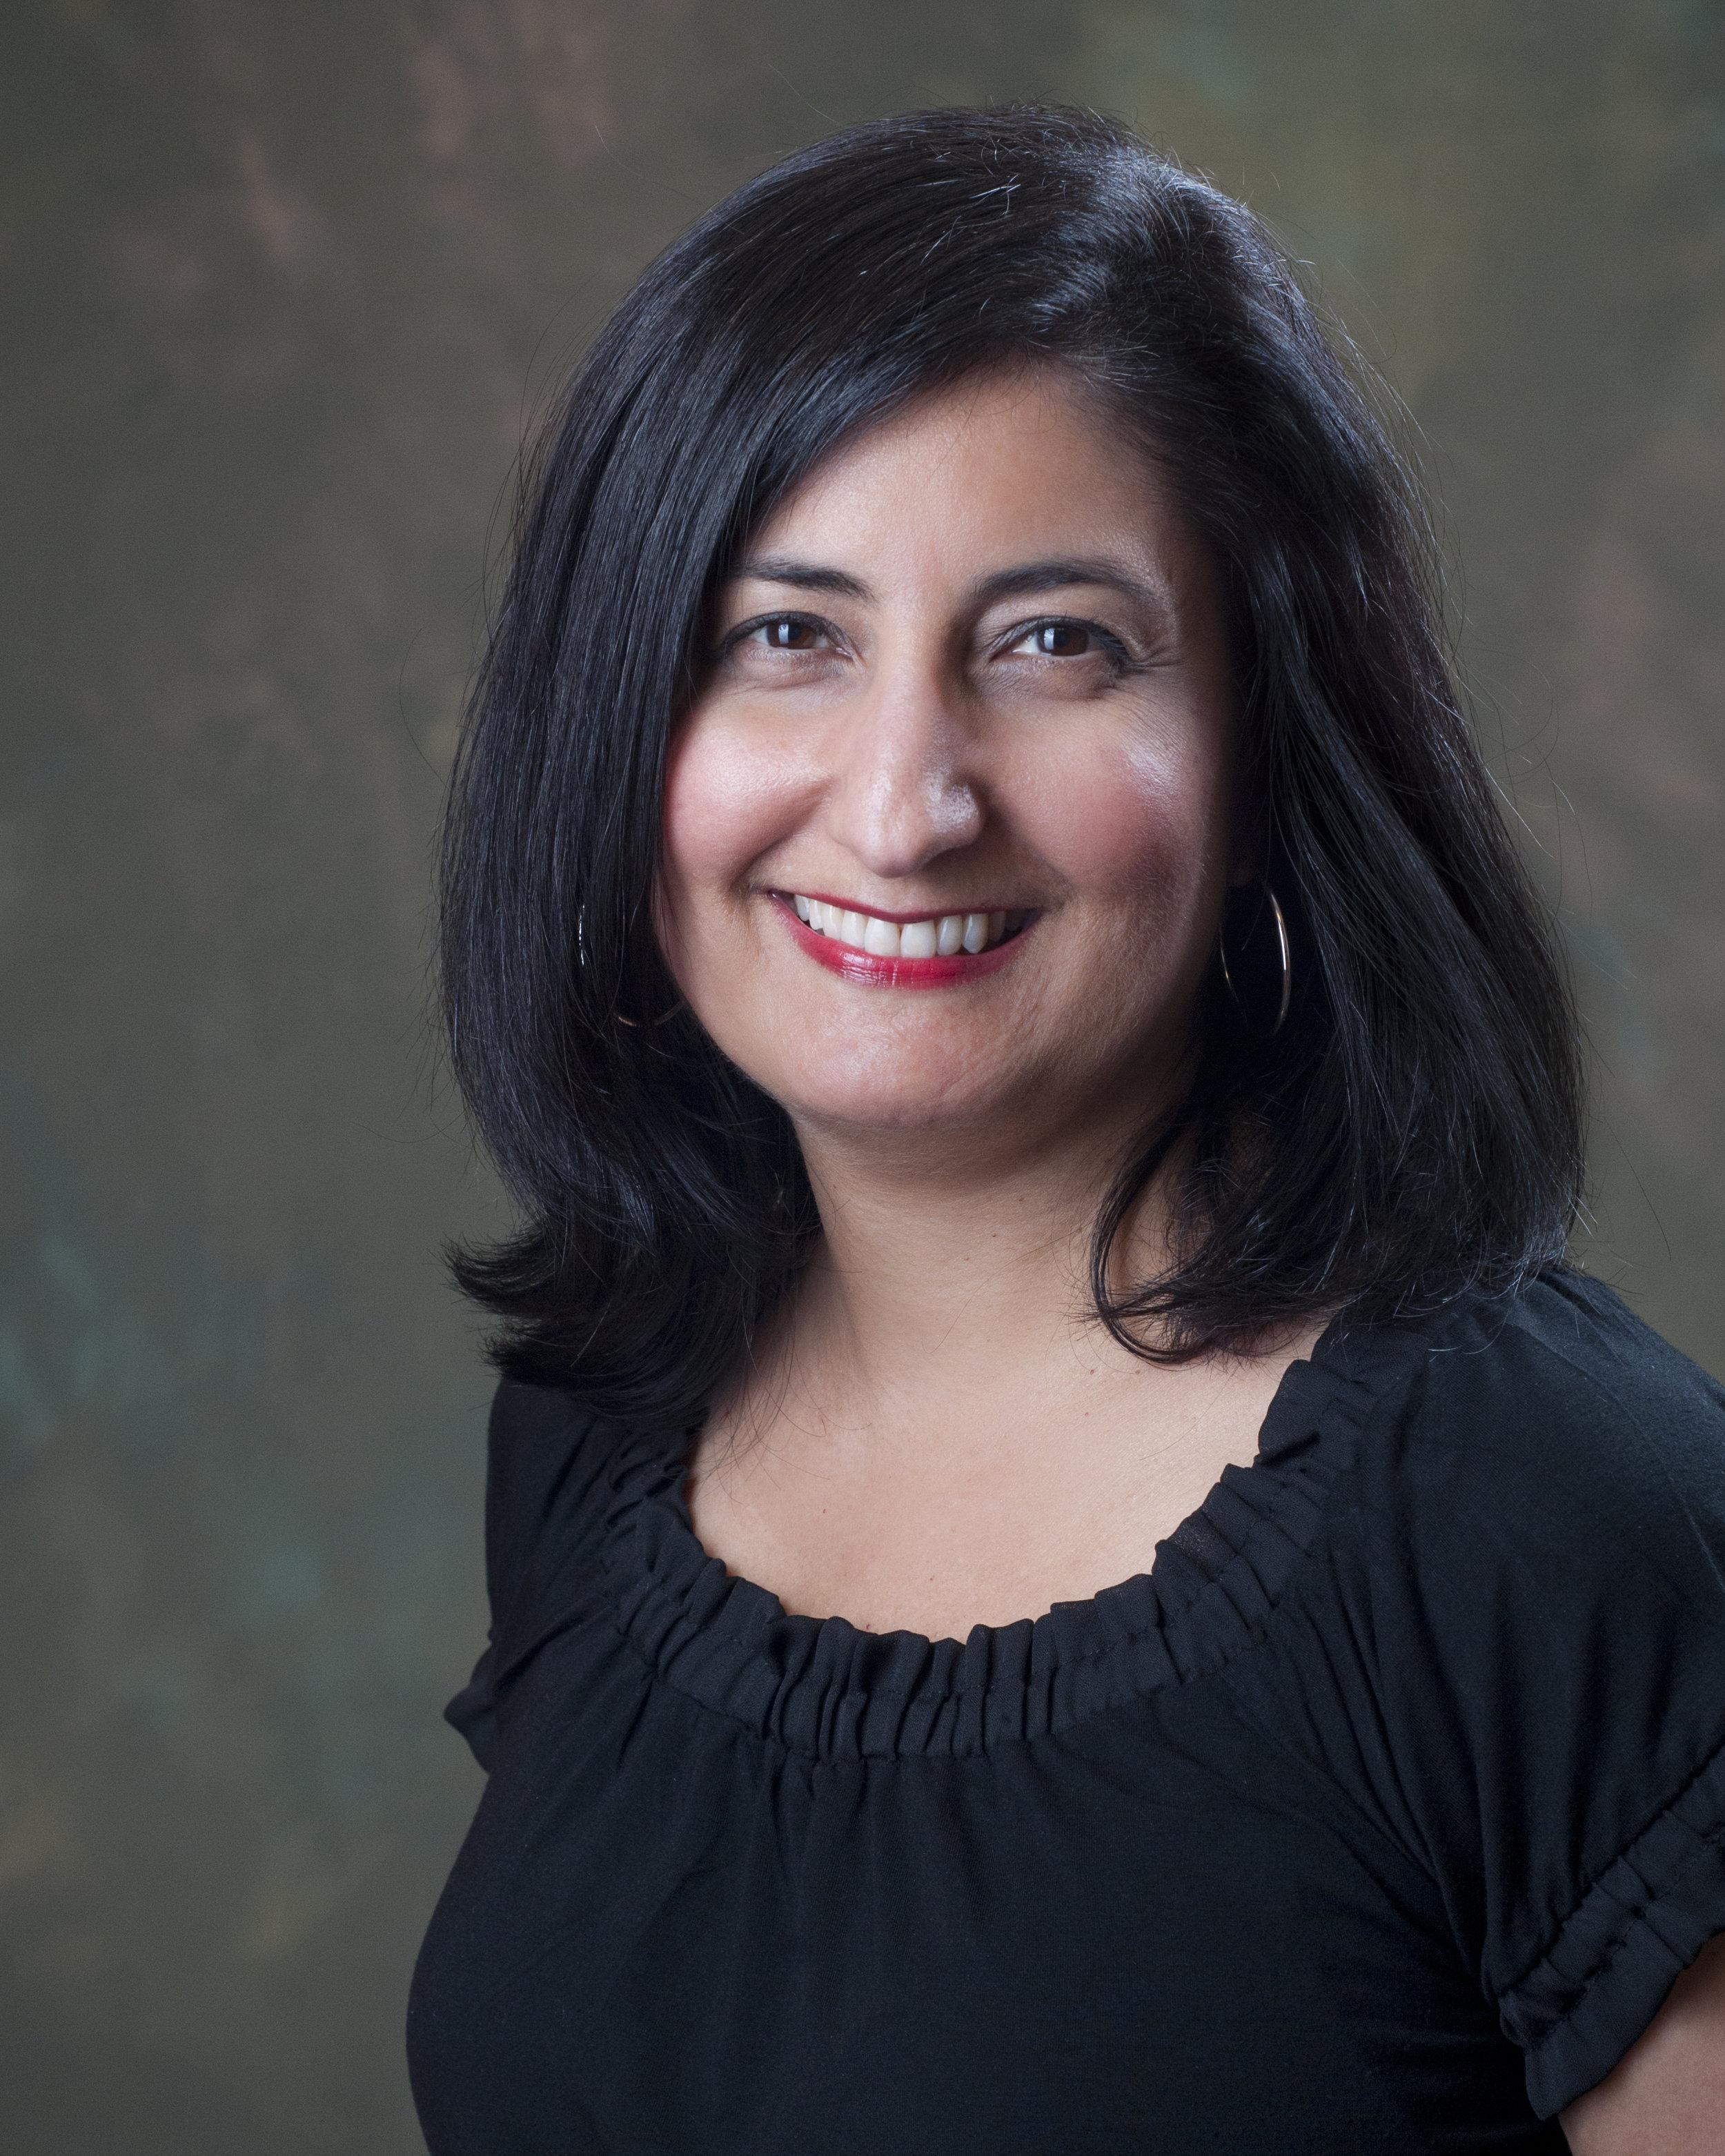 Antoinette Farah, MD FAAP